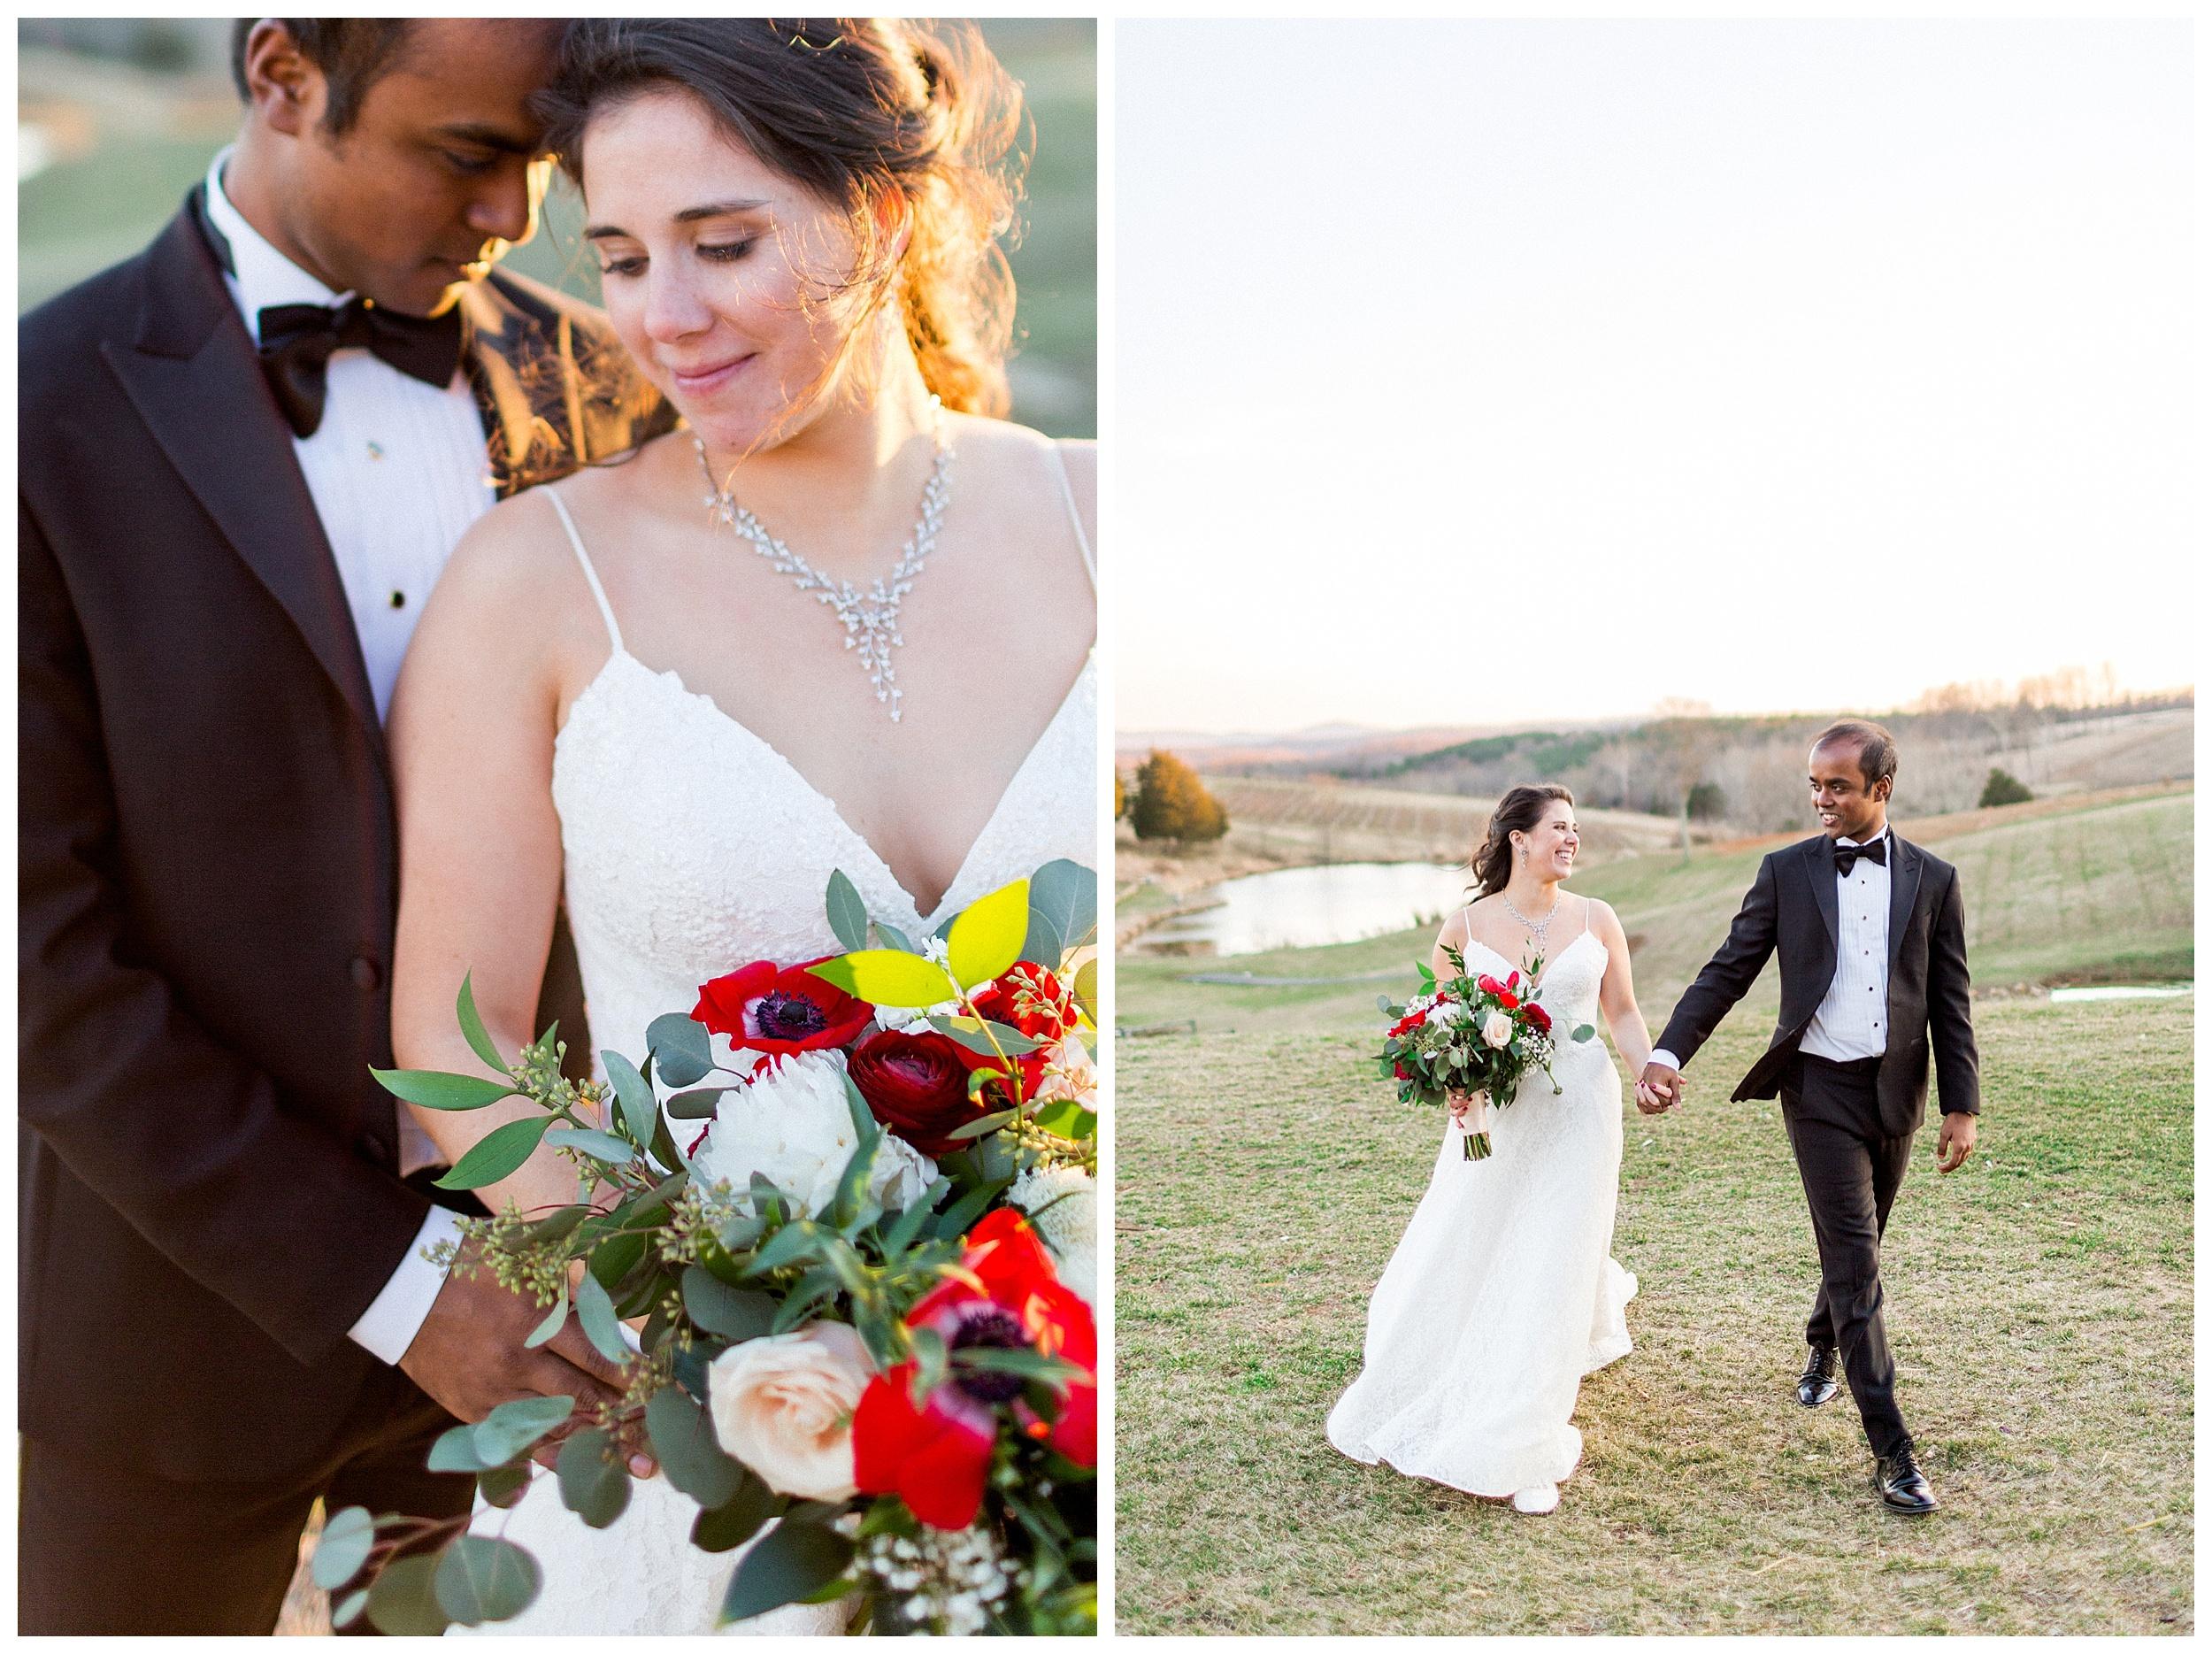 Stone Tower Winery Wedding | Virginia Winter Wedding | VA Wedding Photographer Kir Tuben_0109.jpg